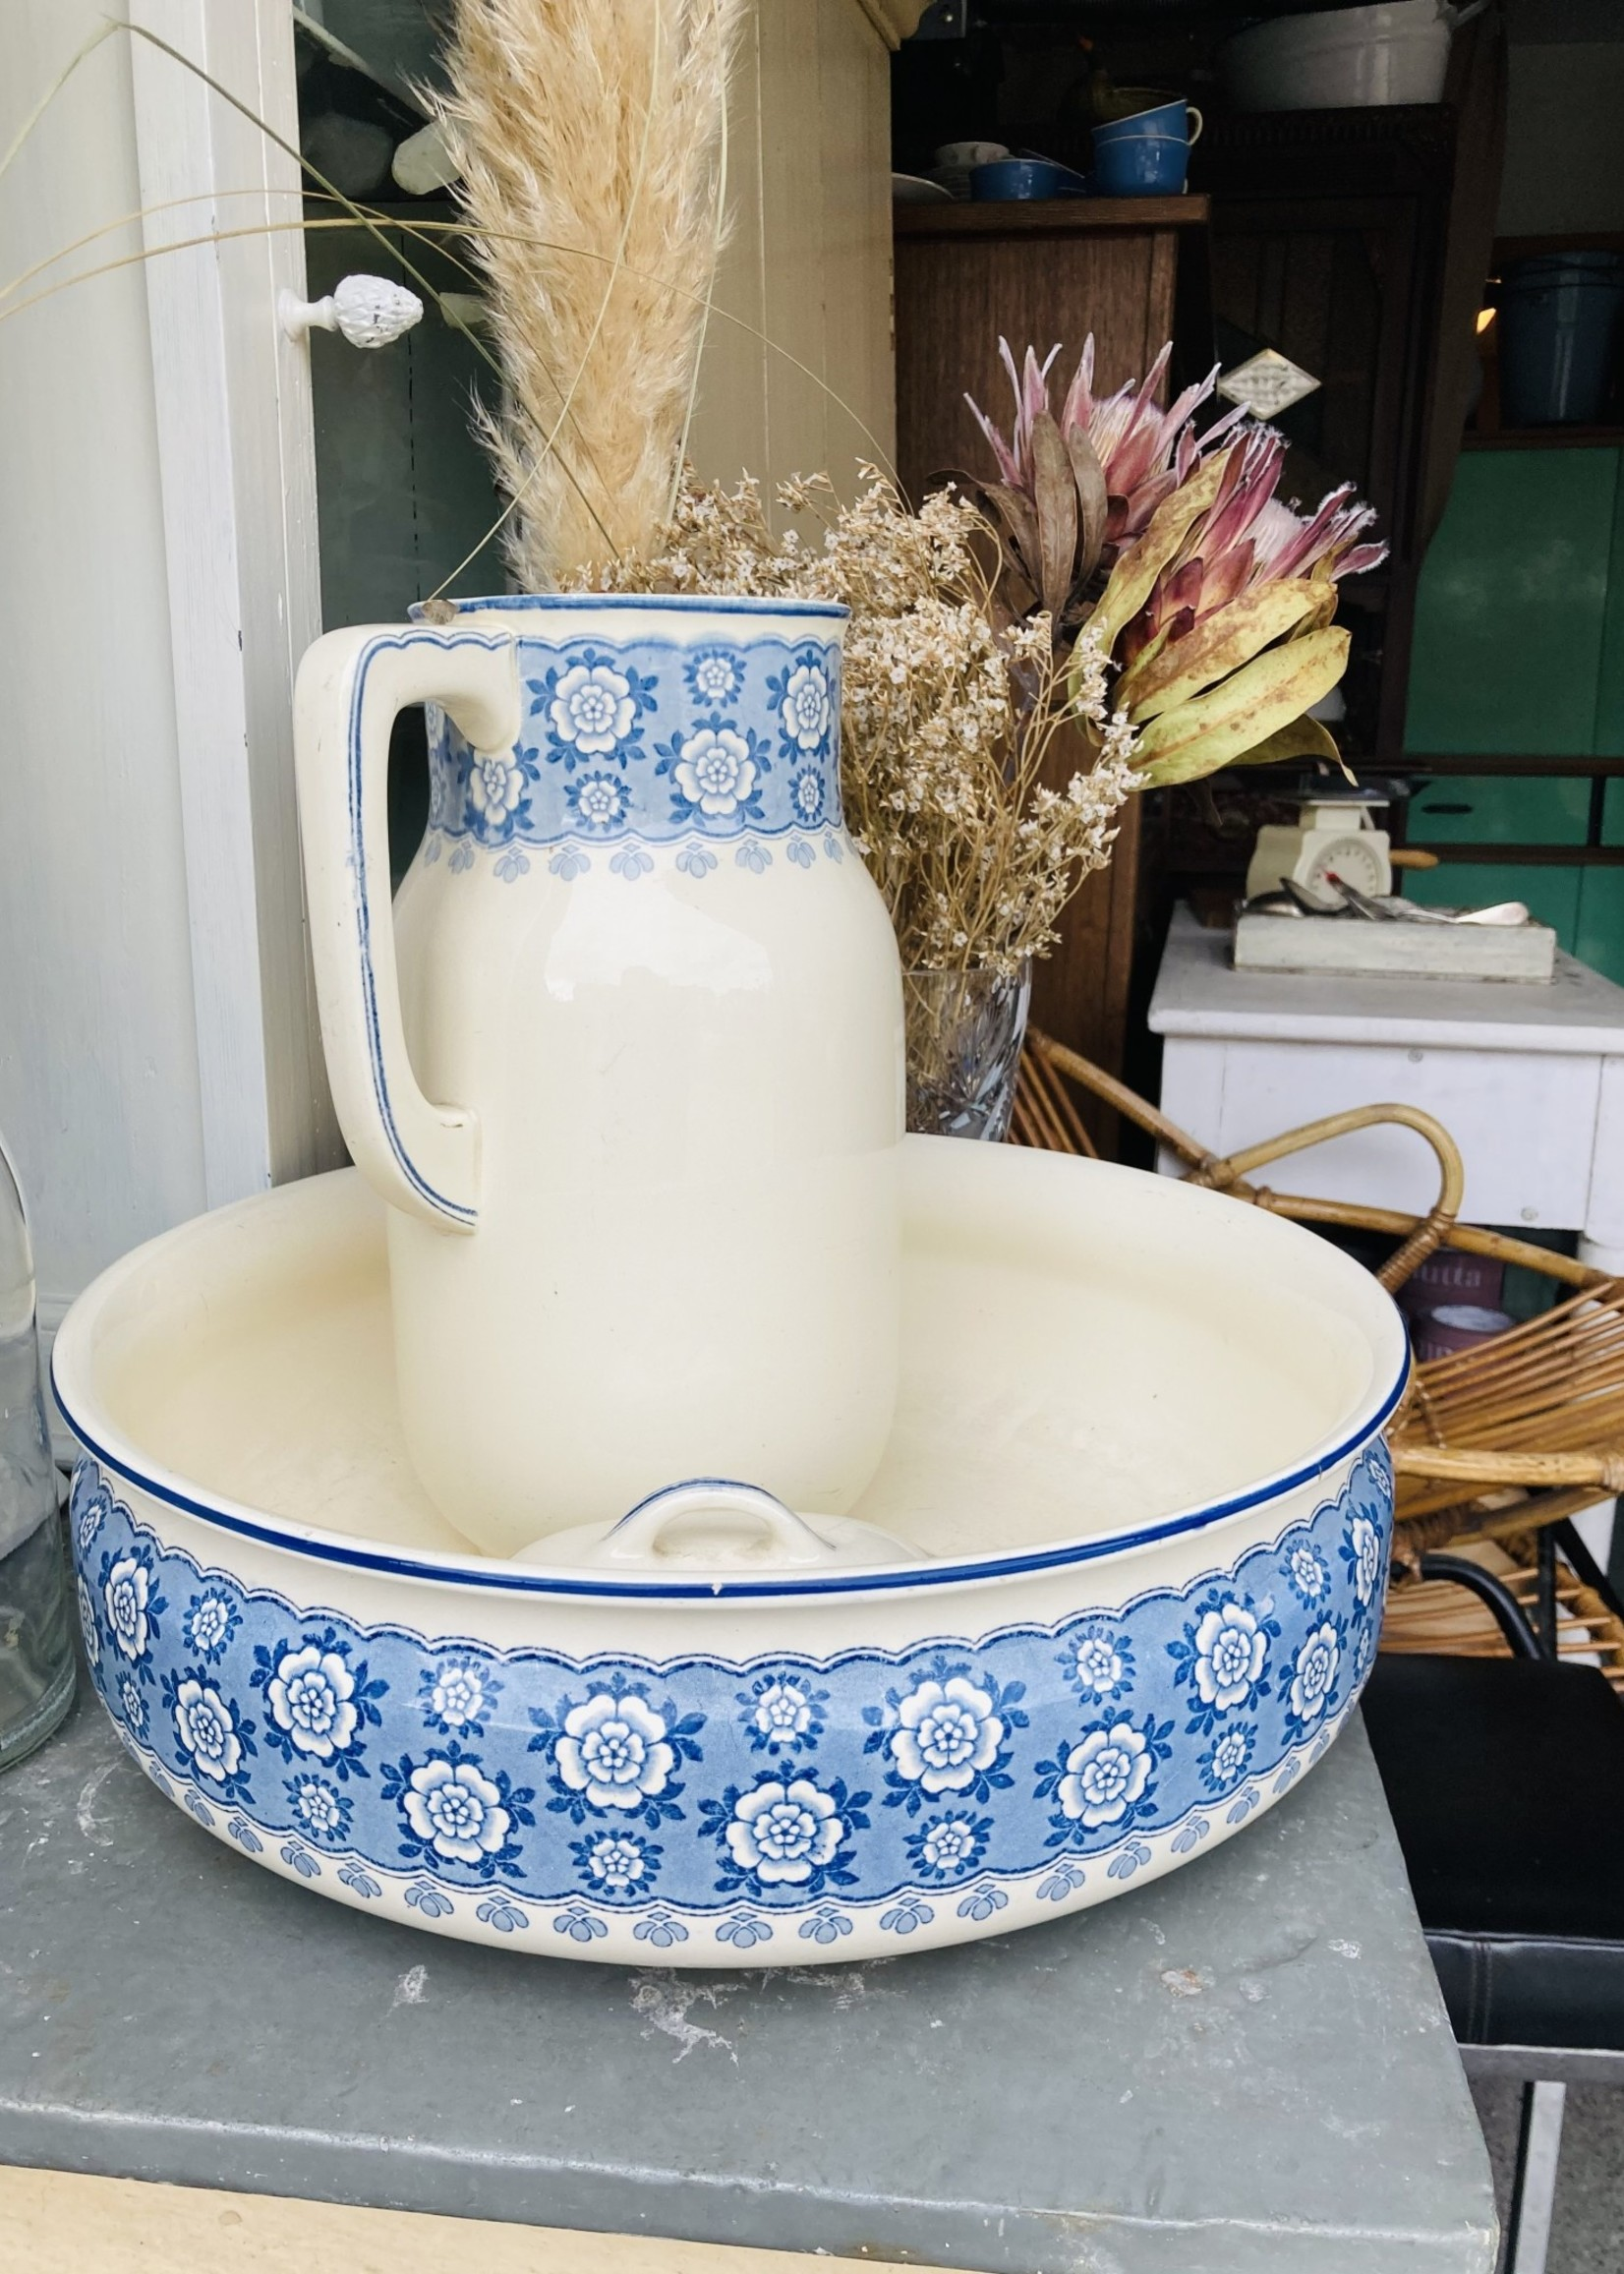 Large dish from Villeroy & Boch model Drina